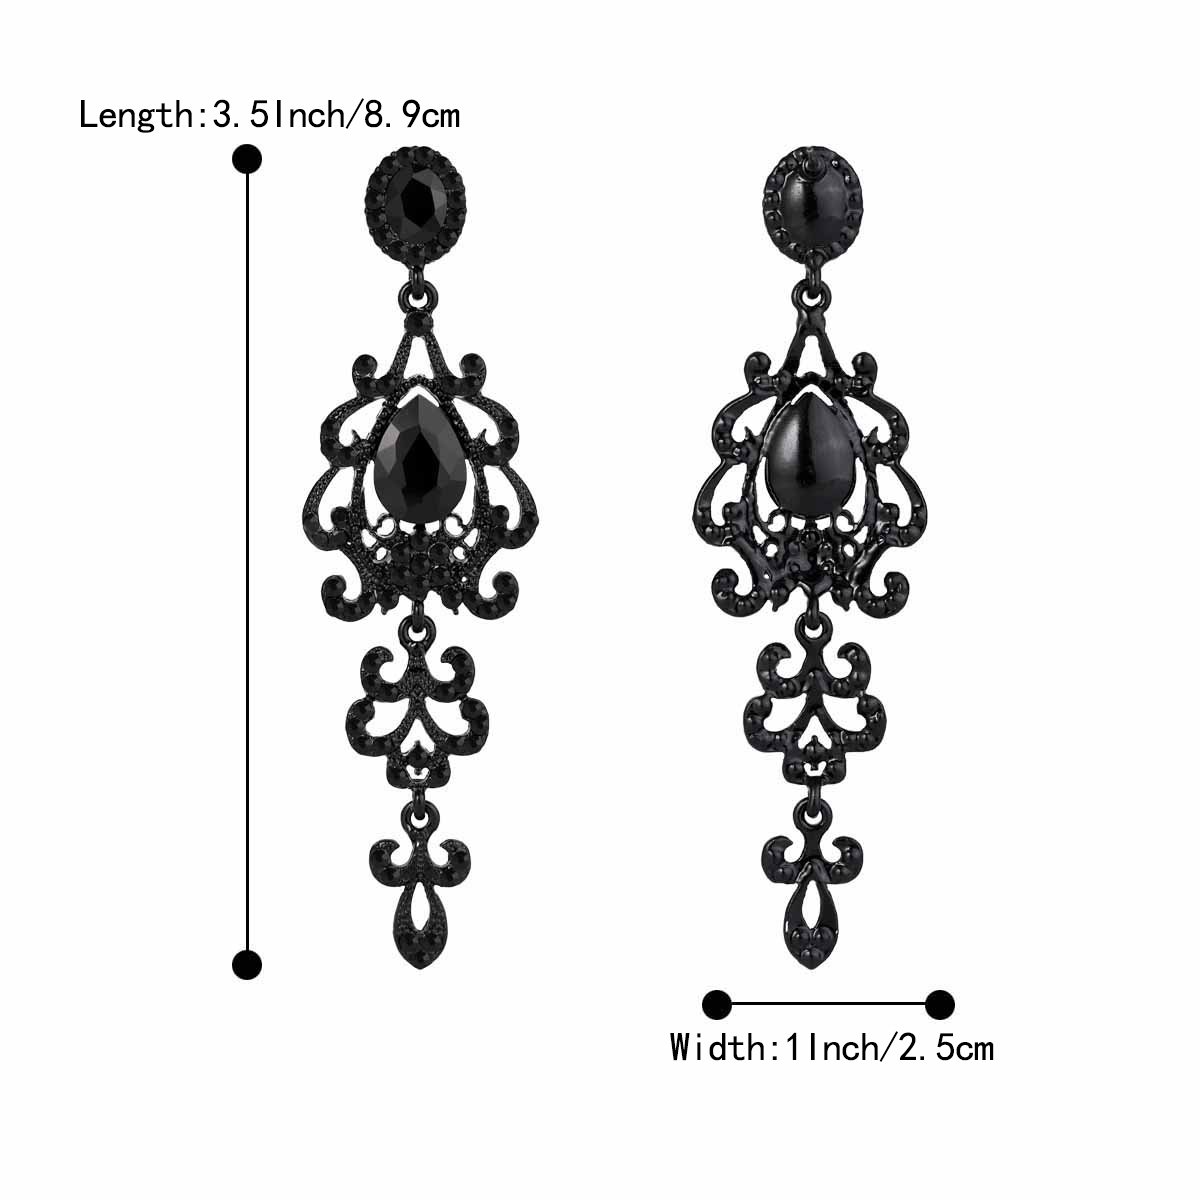 BriLove Women's Wedding Bridal Dangle Earrings with Victorian Style Crystal Teardrop Chandelier Black Black-Silver-Tone by BriLove (Image #5)